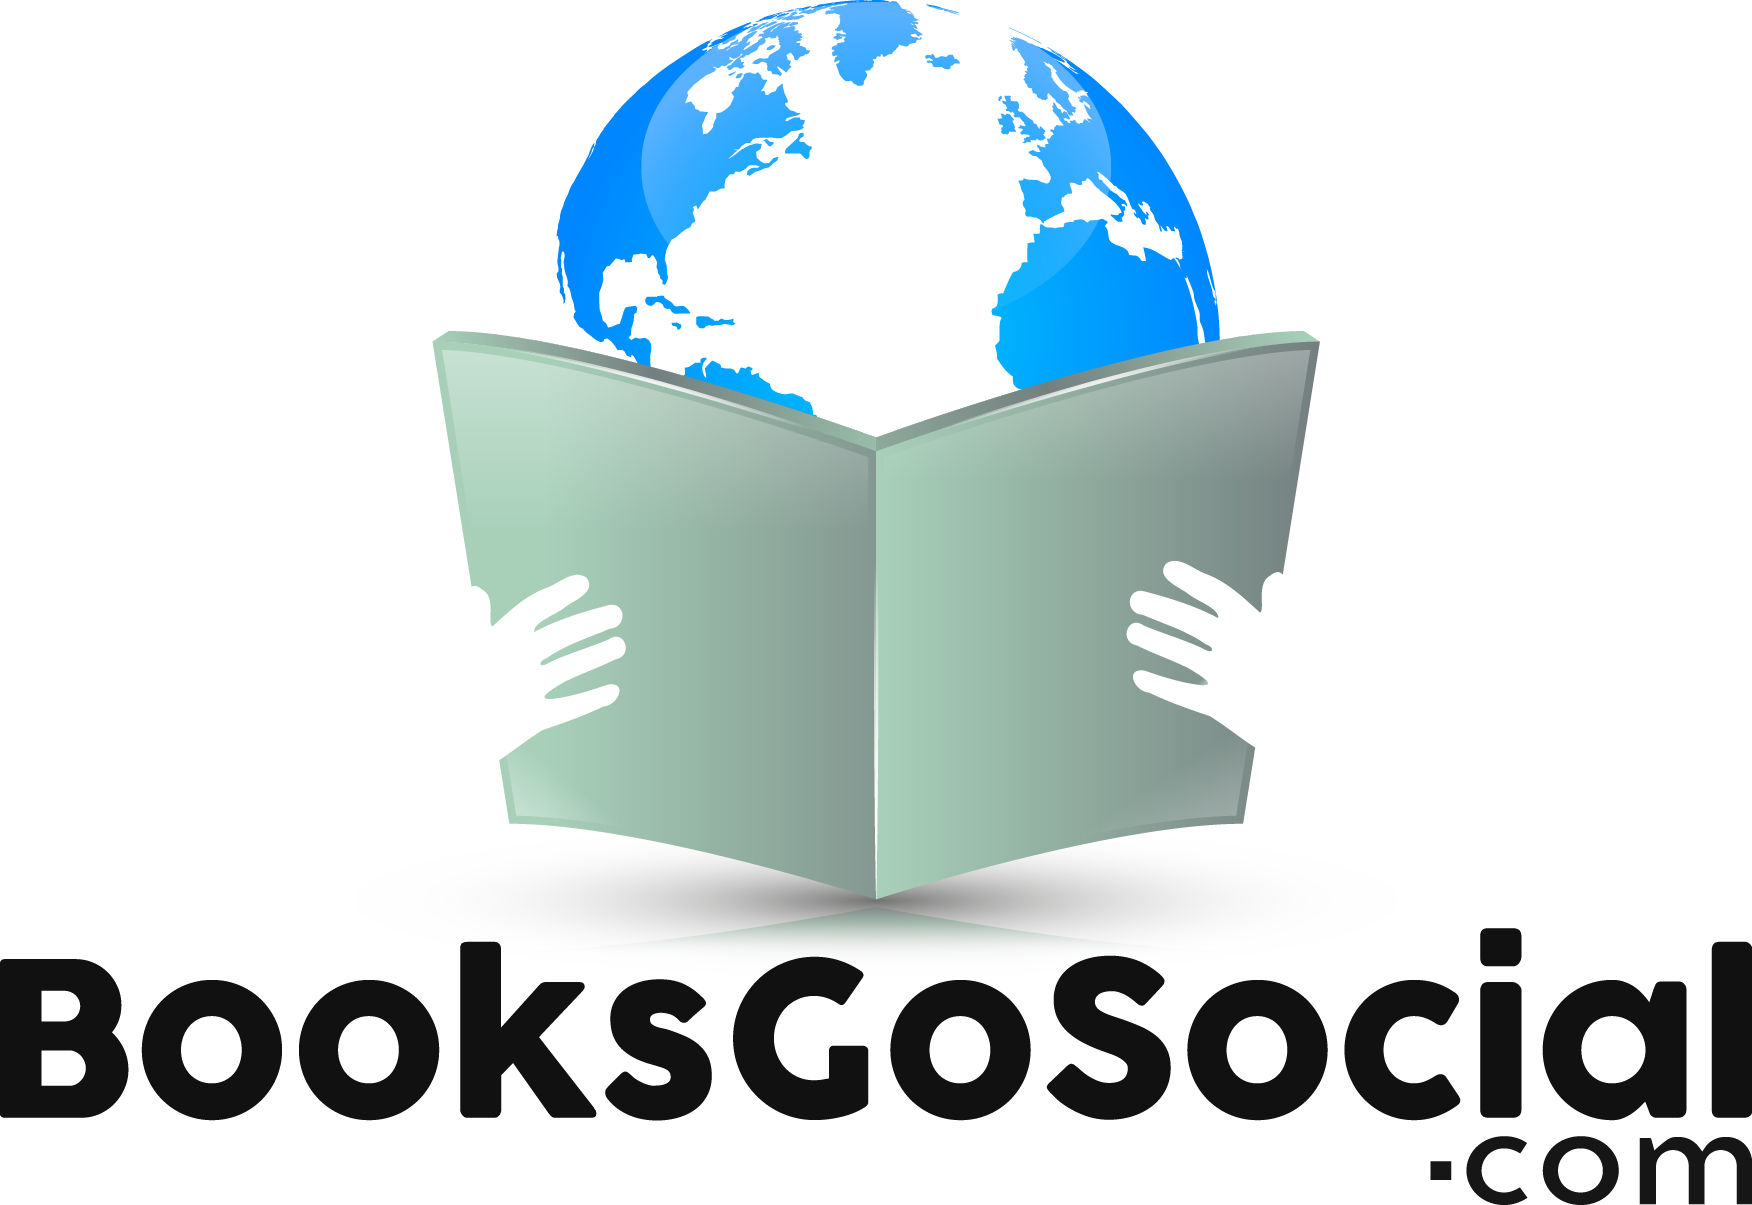 Books Go Social